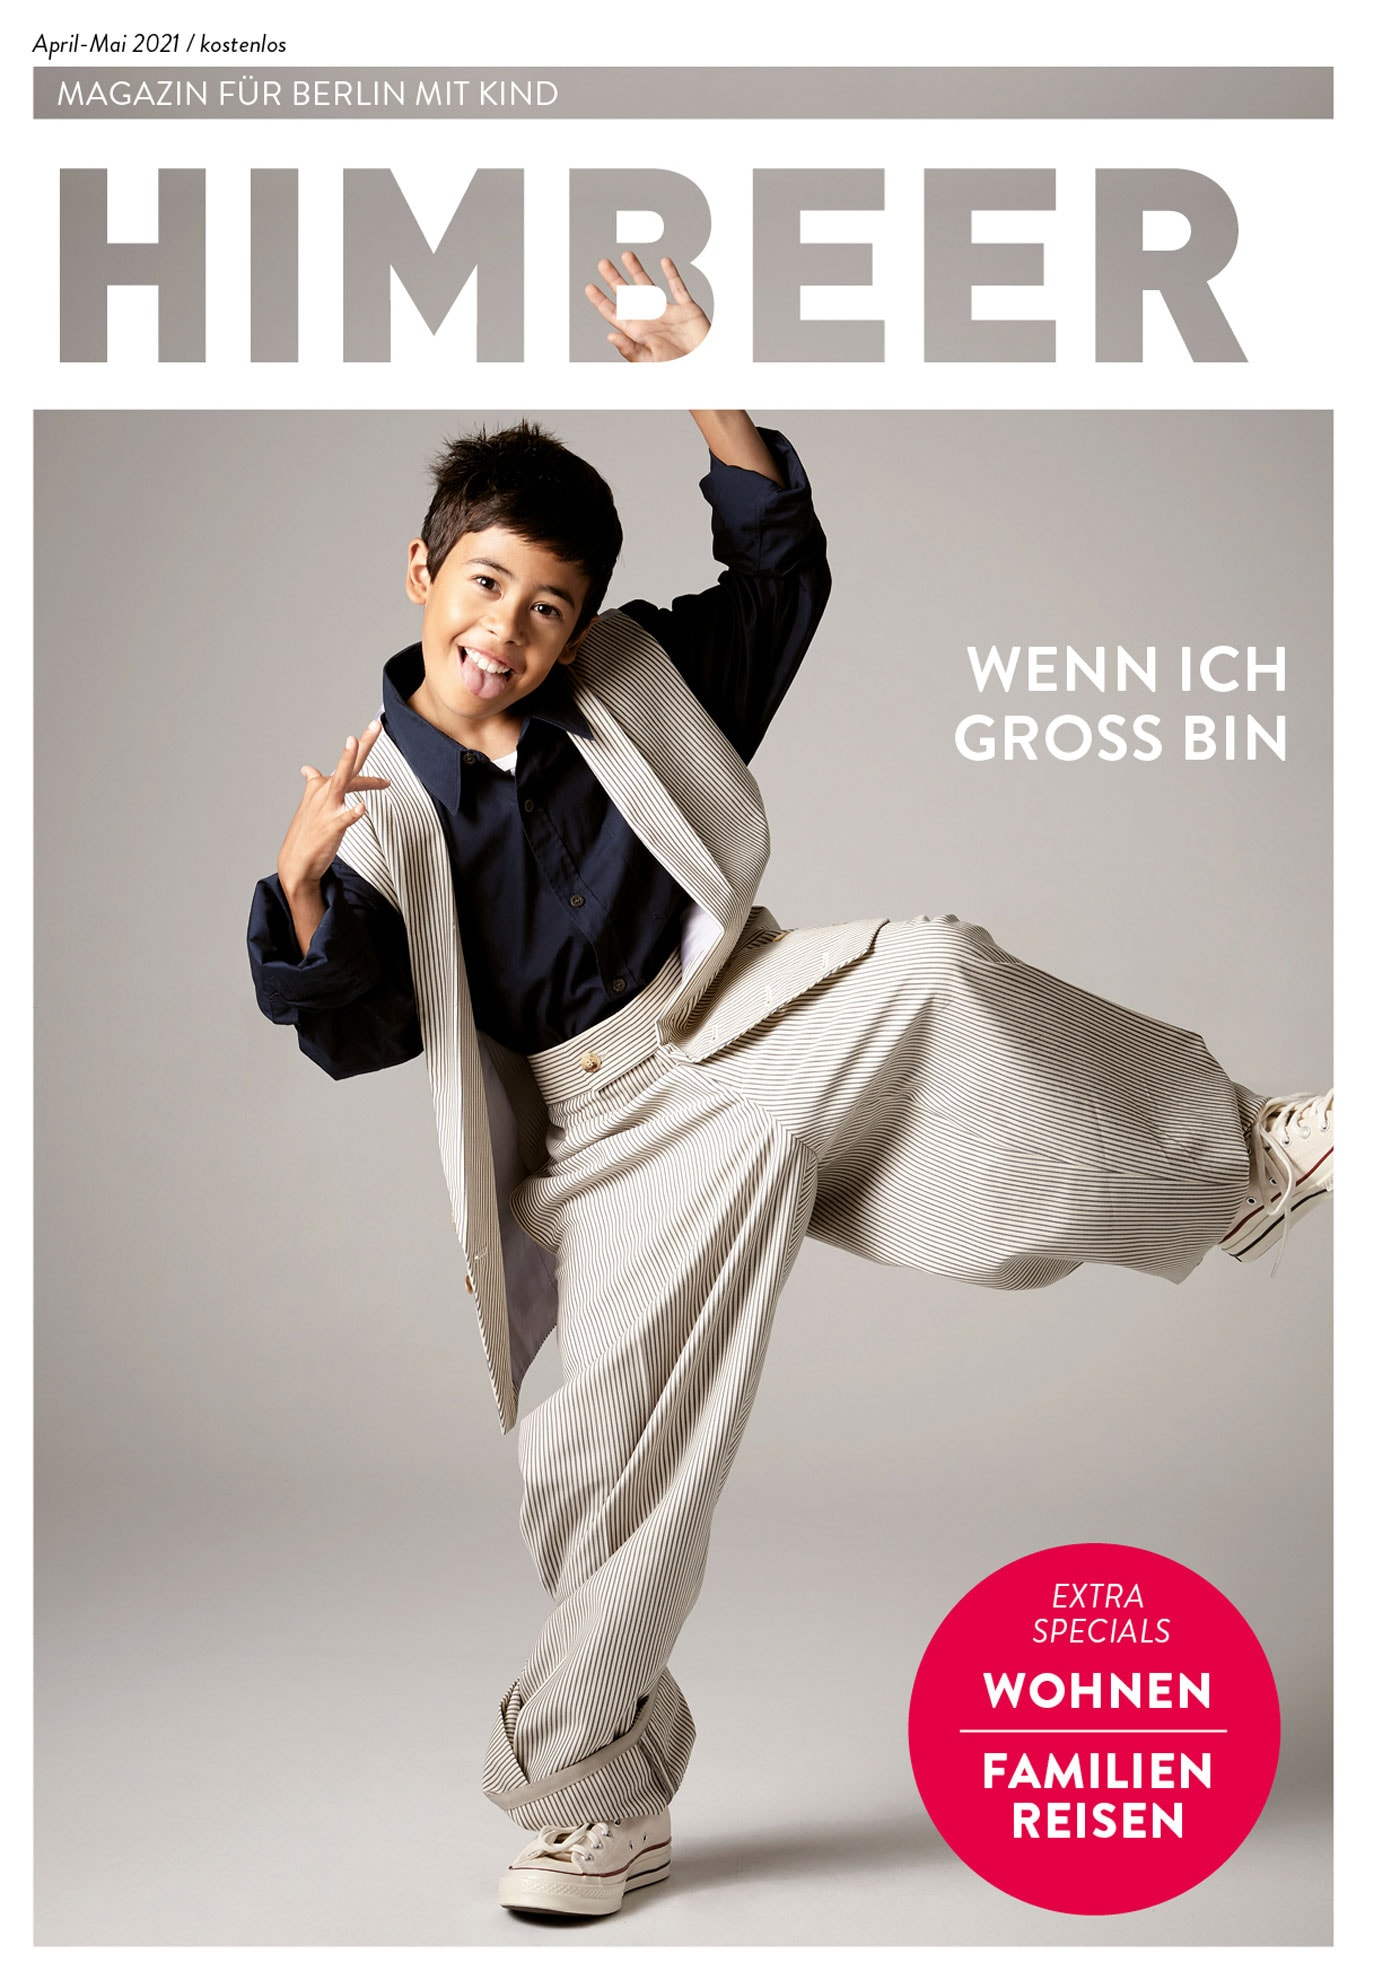 HIMBEER Magazin für Berlin mit Kind April-Mai 2021 // HIMBEER